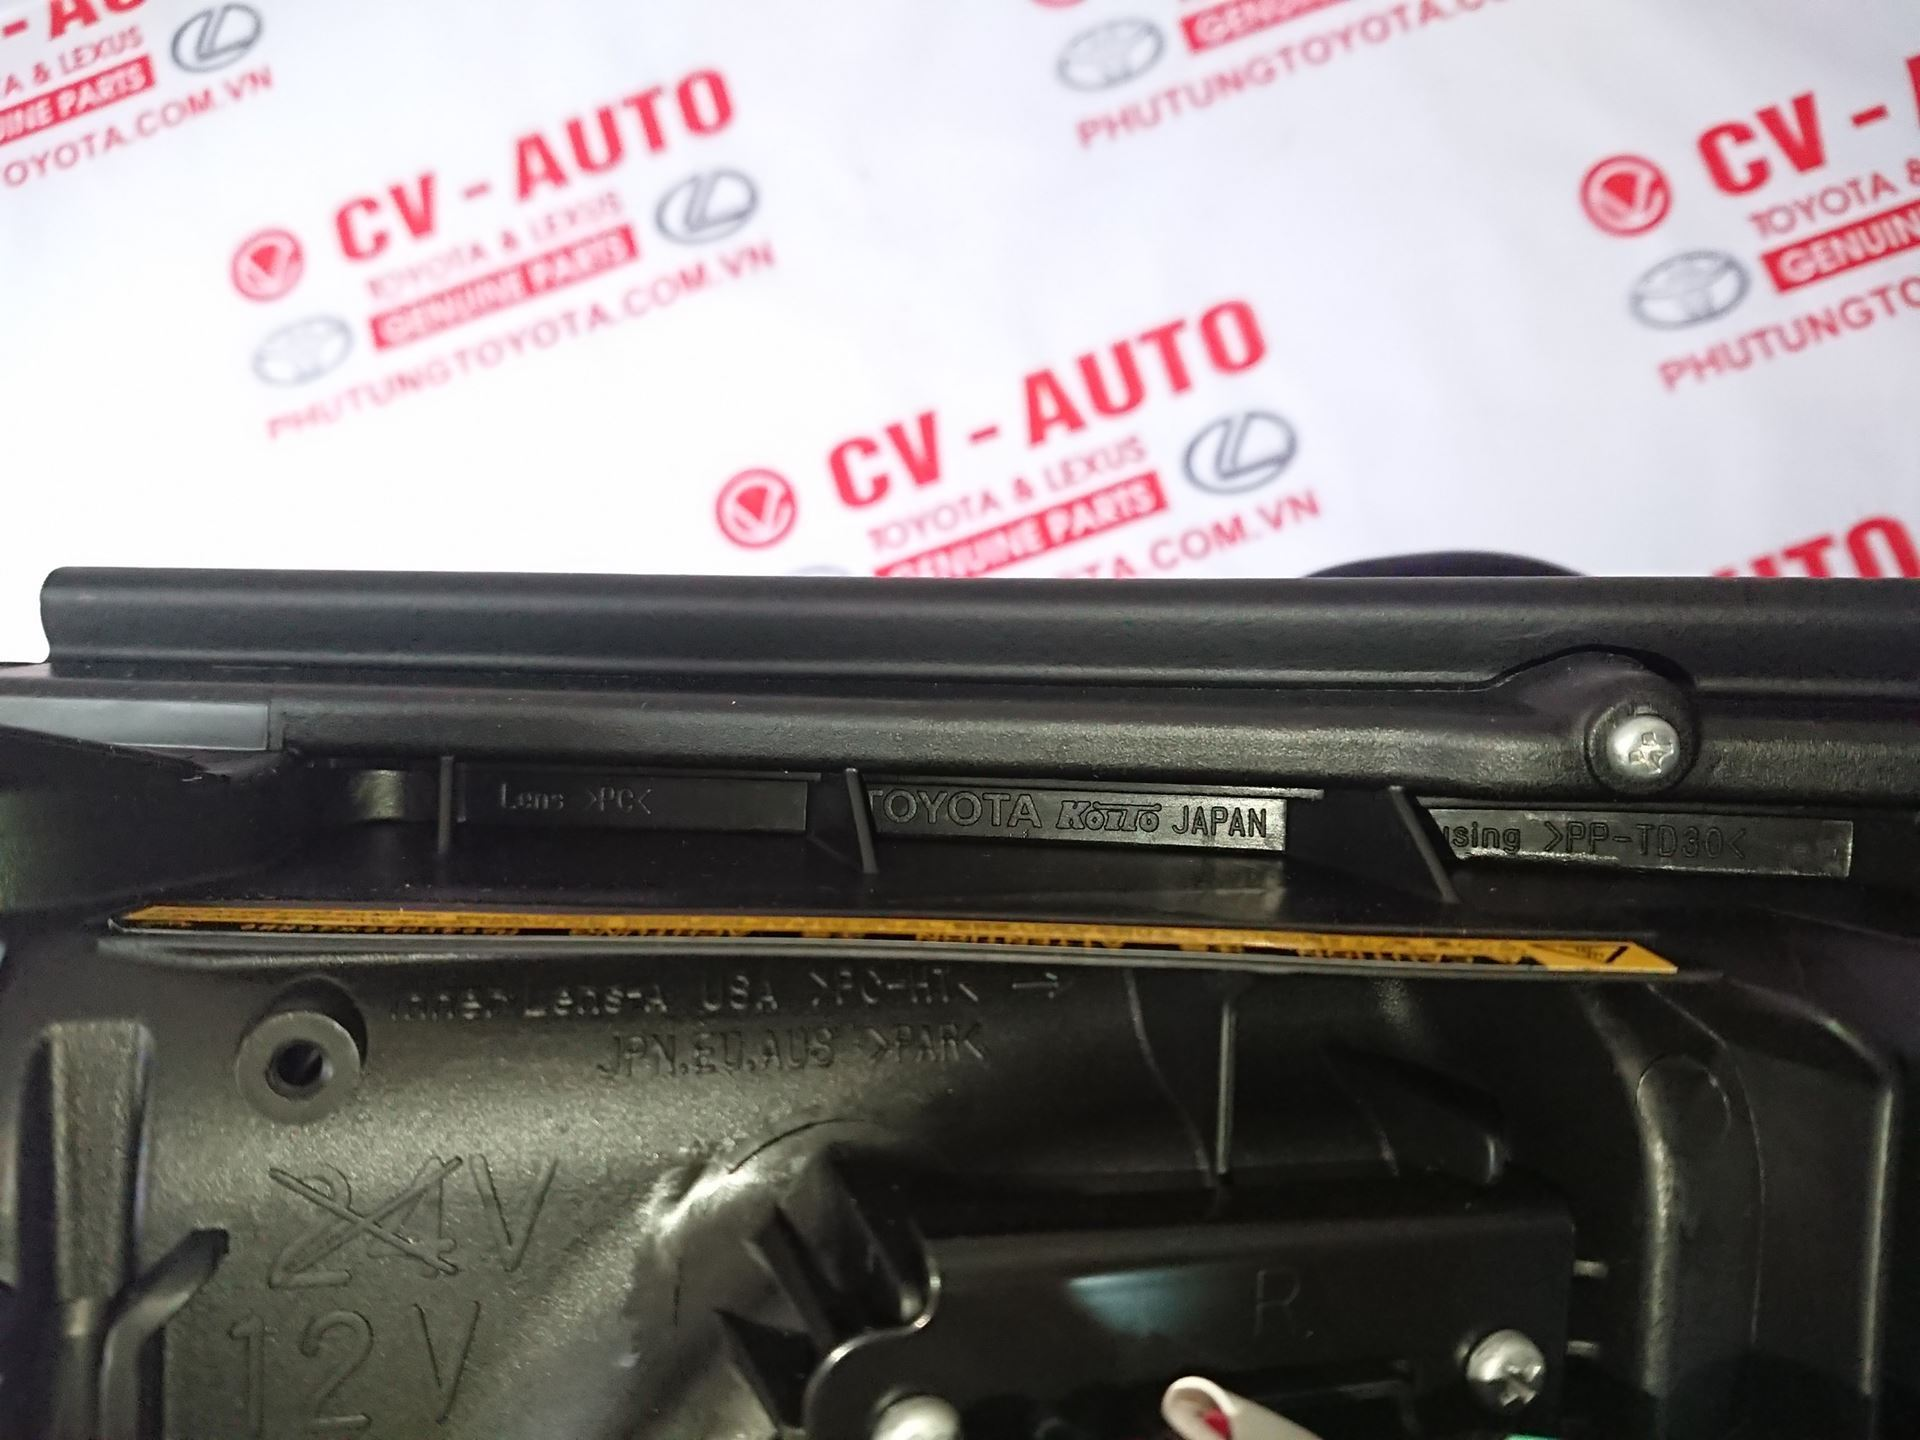 Picture of 81145-60F30 Đèn pha phải Toyota Land Cruiser model 2013 2014 2015